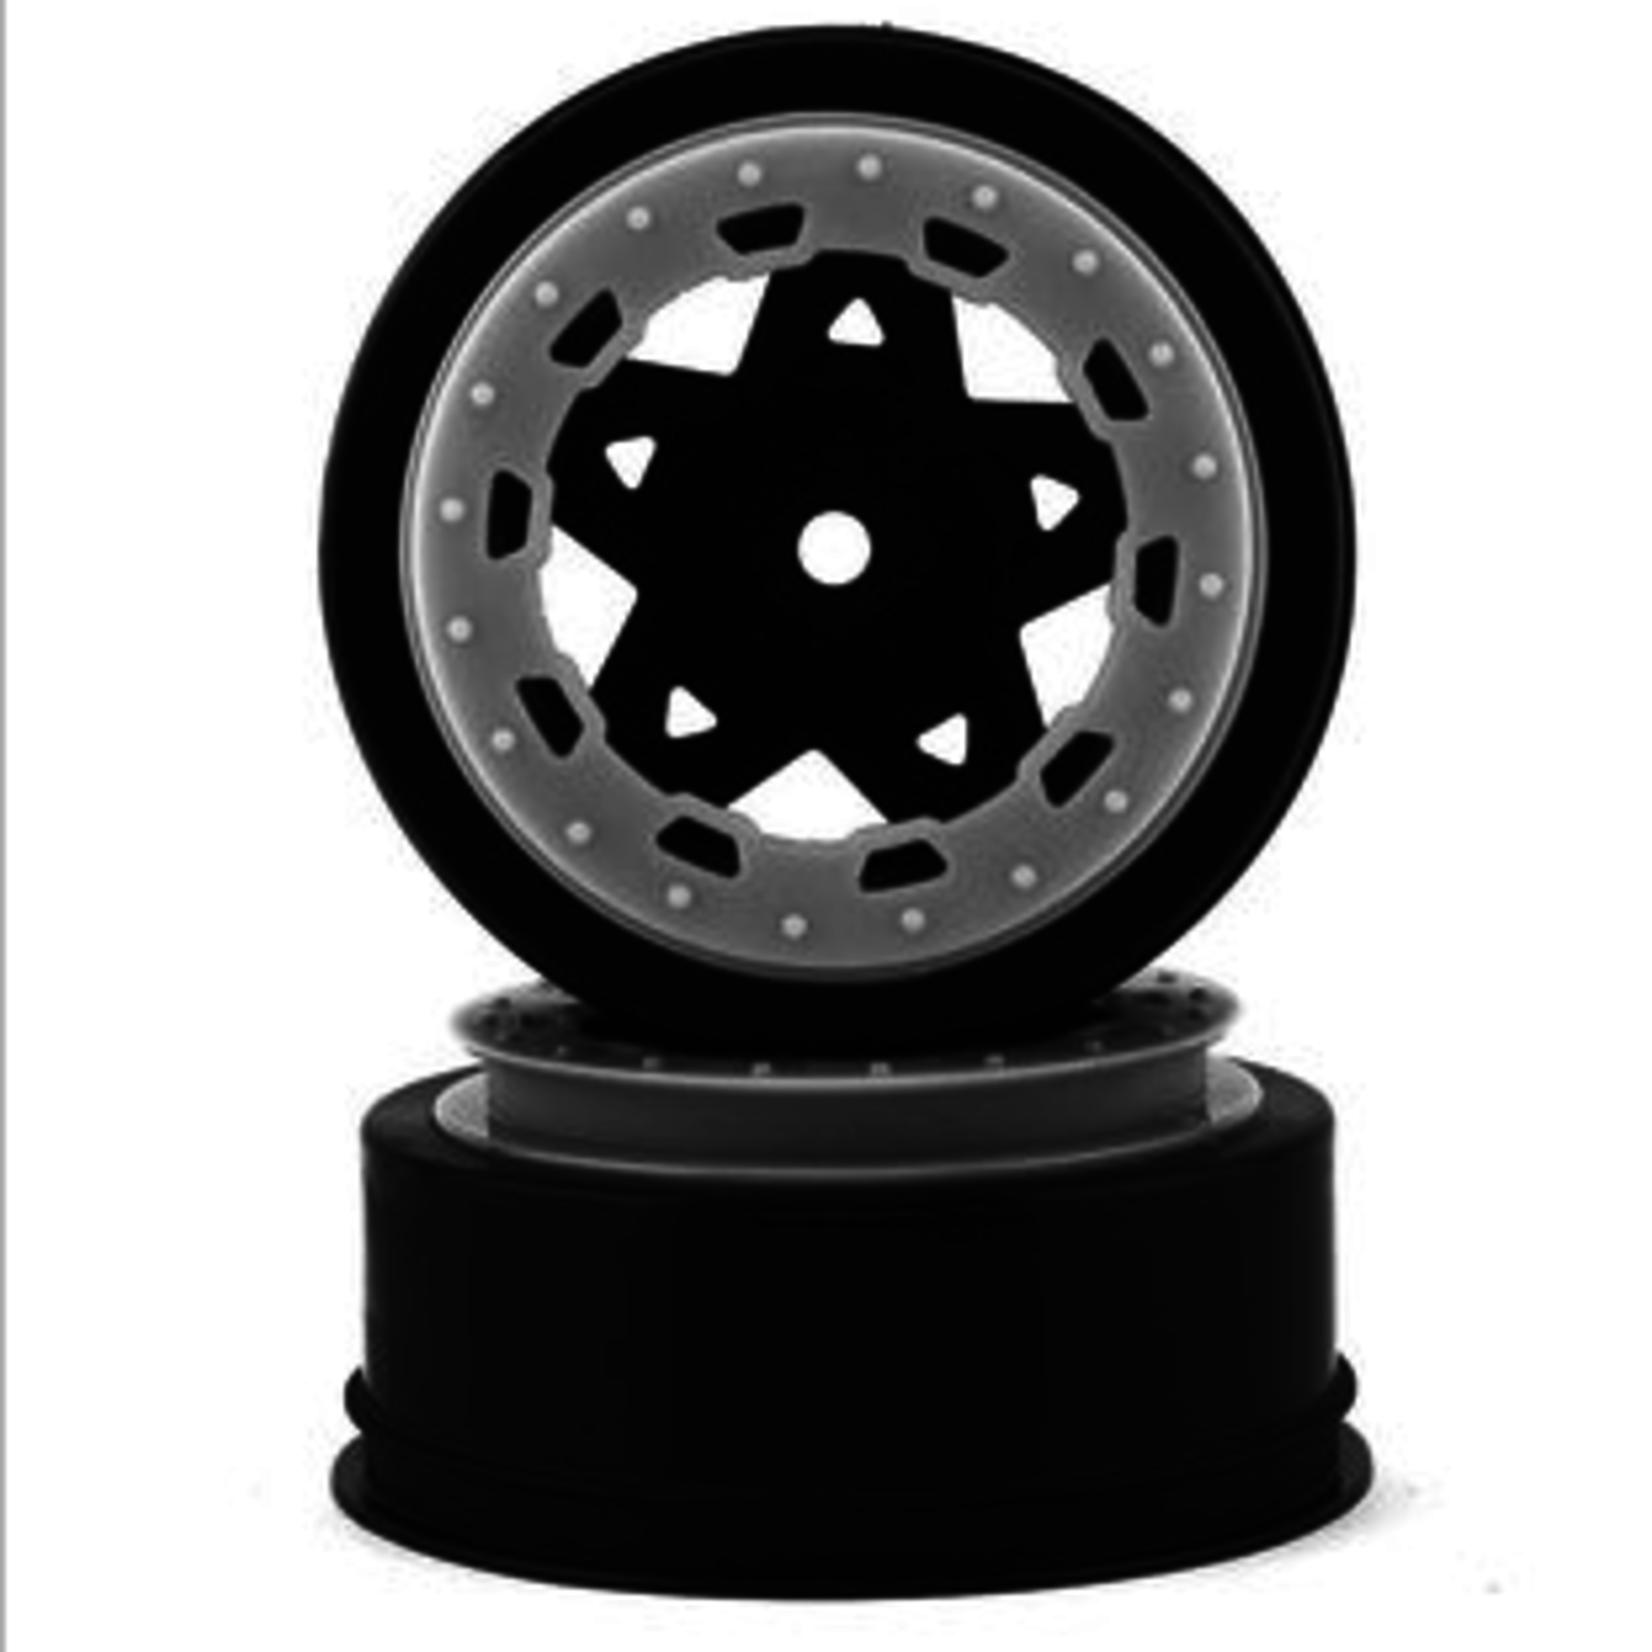 JConcepts JCO3390BW JConcepts Tremor Slash narrow front wheel-BLK/WHT BDLCK (2)